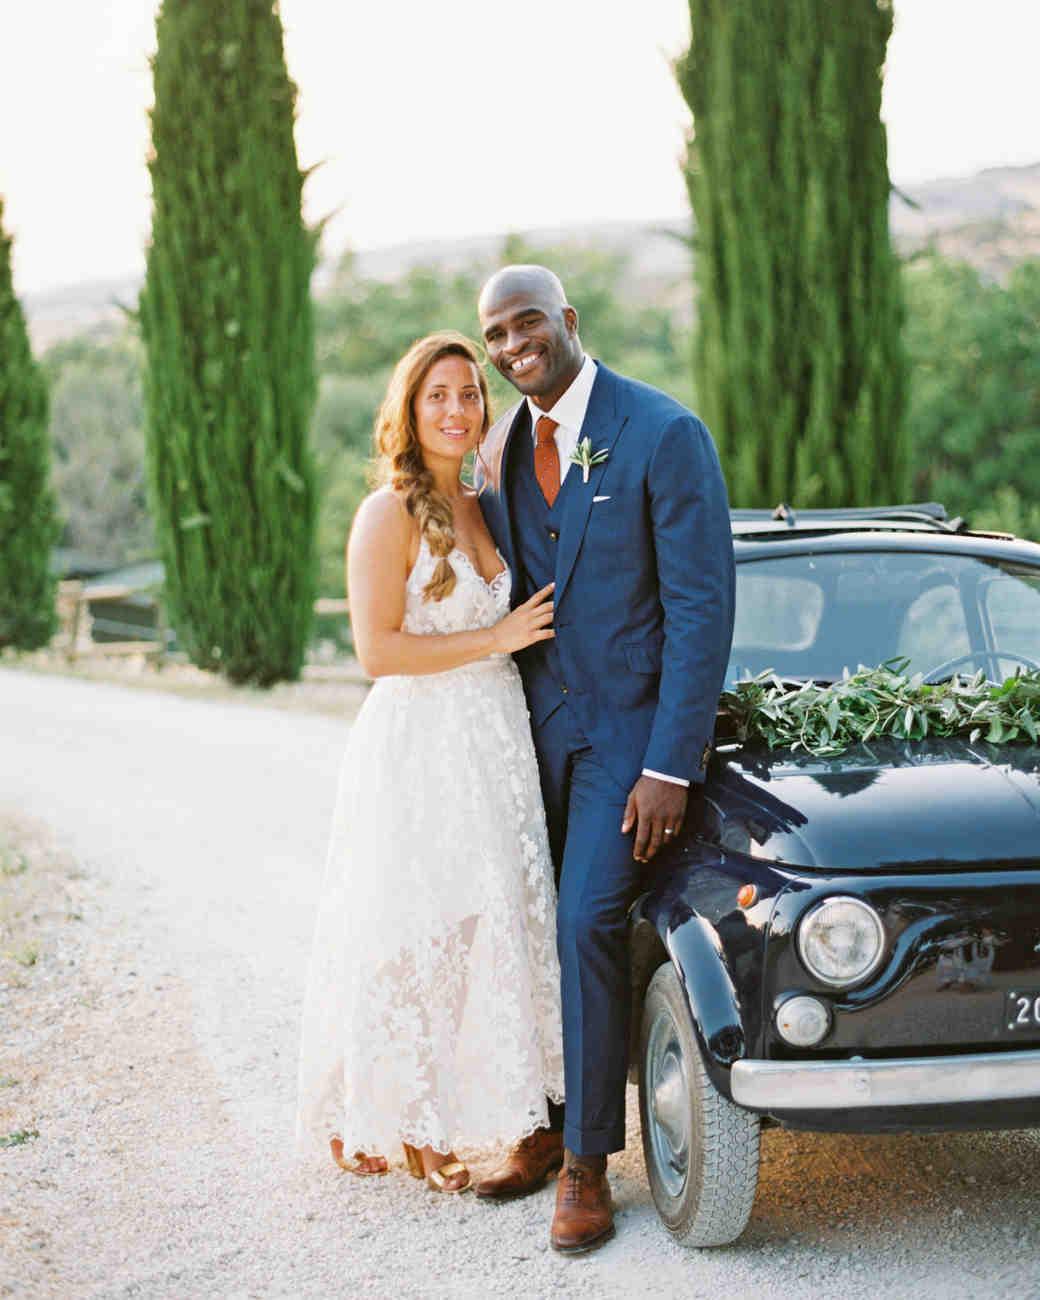 leila joel wedding couple next to car